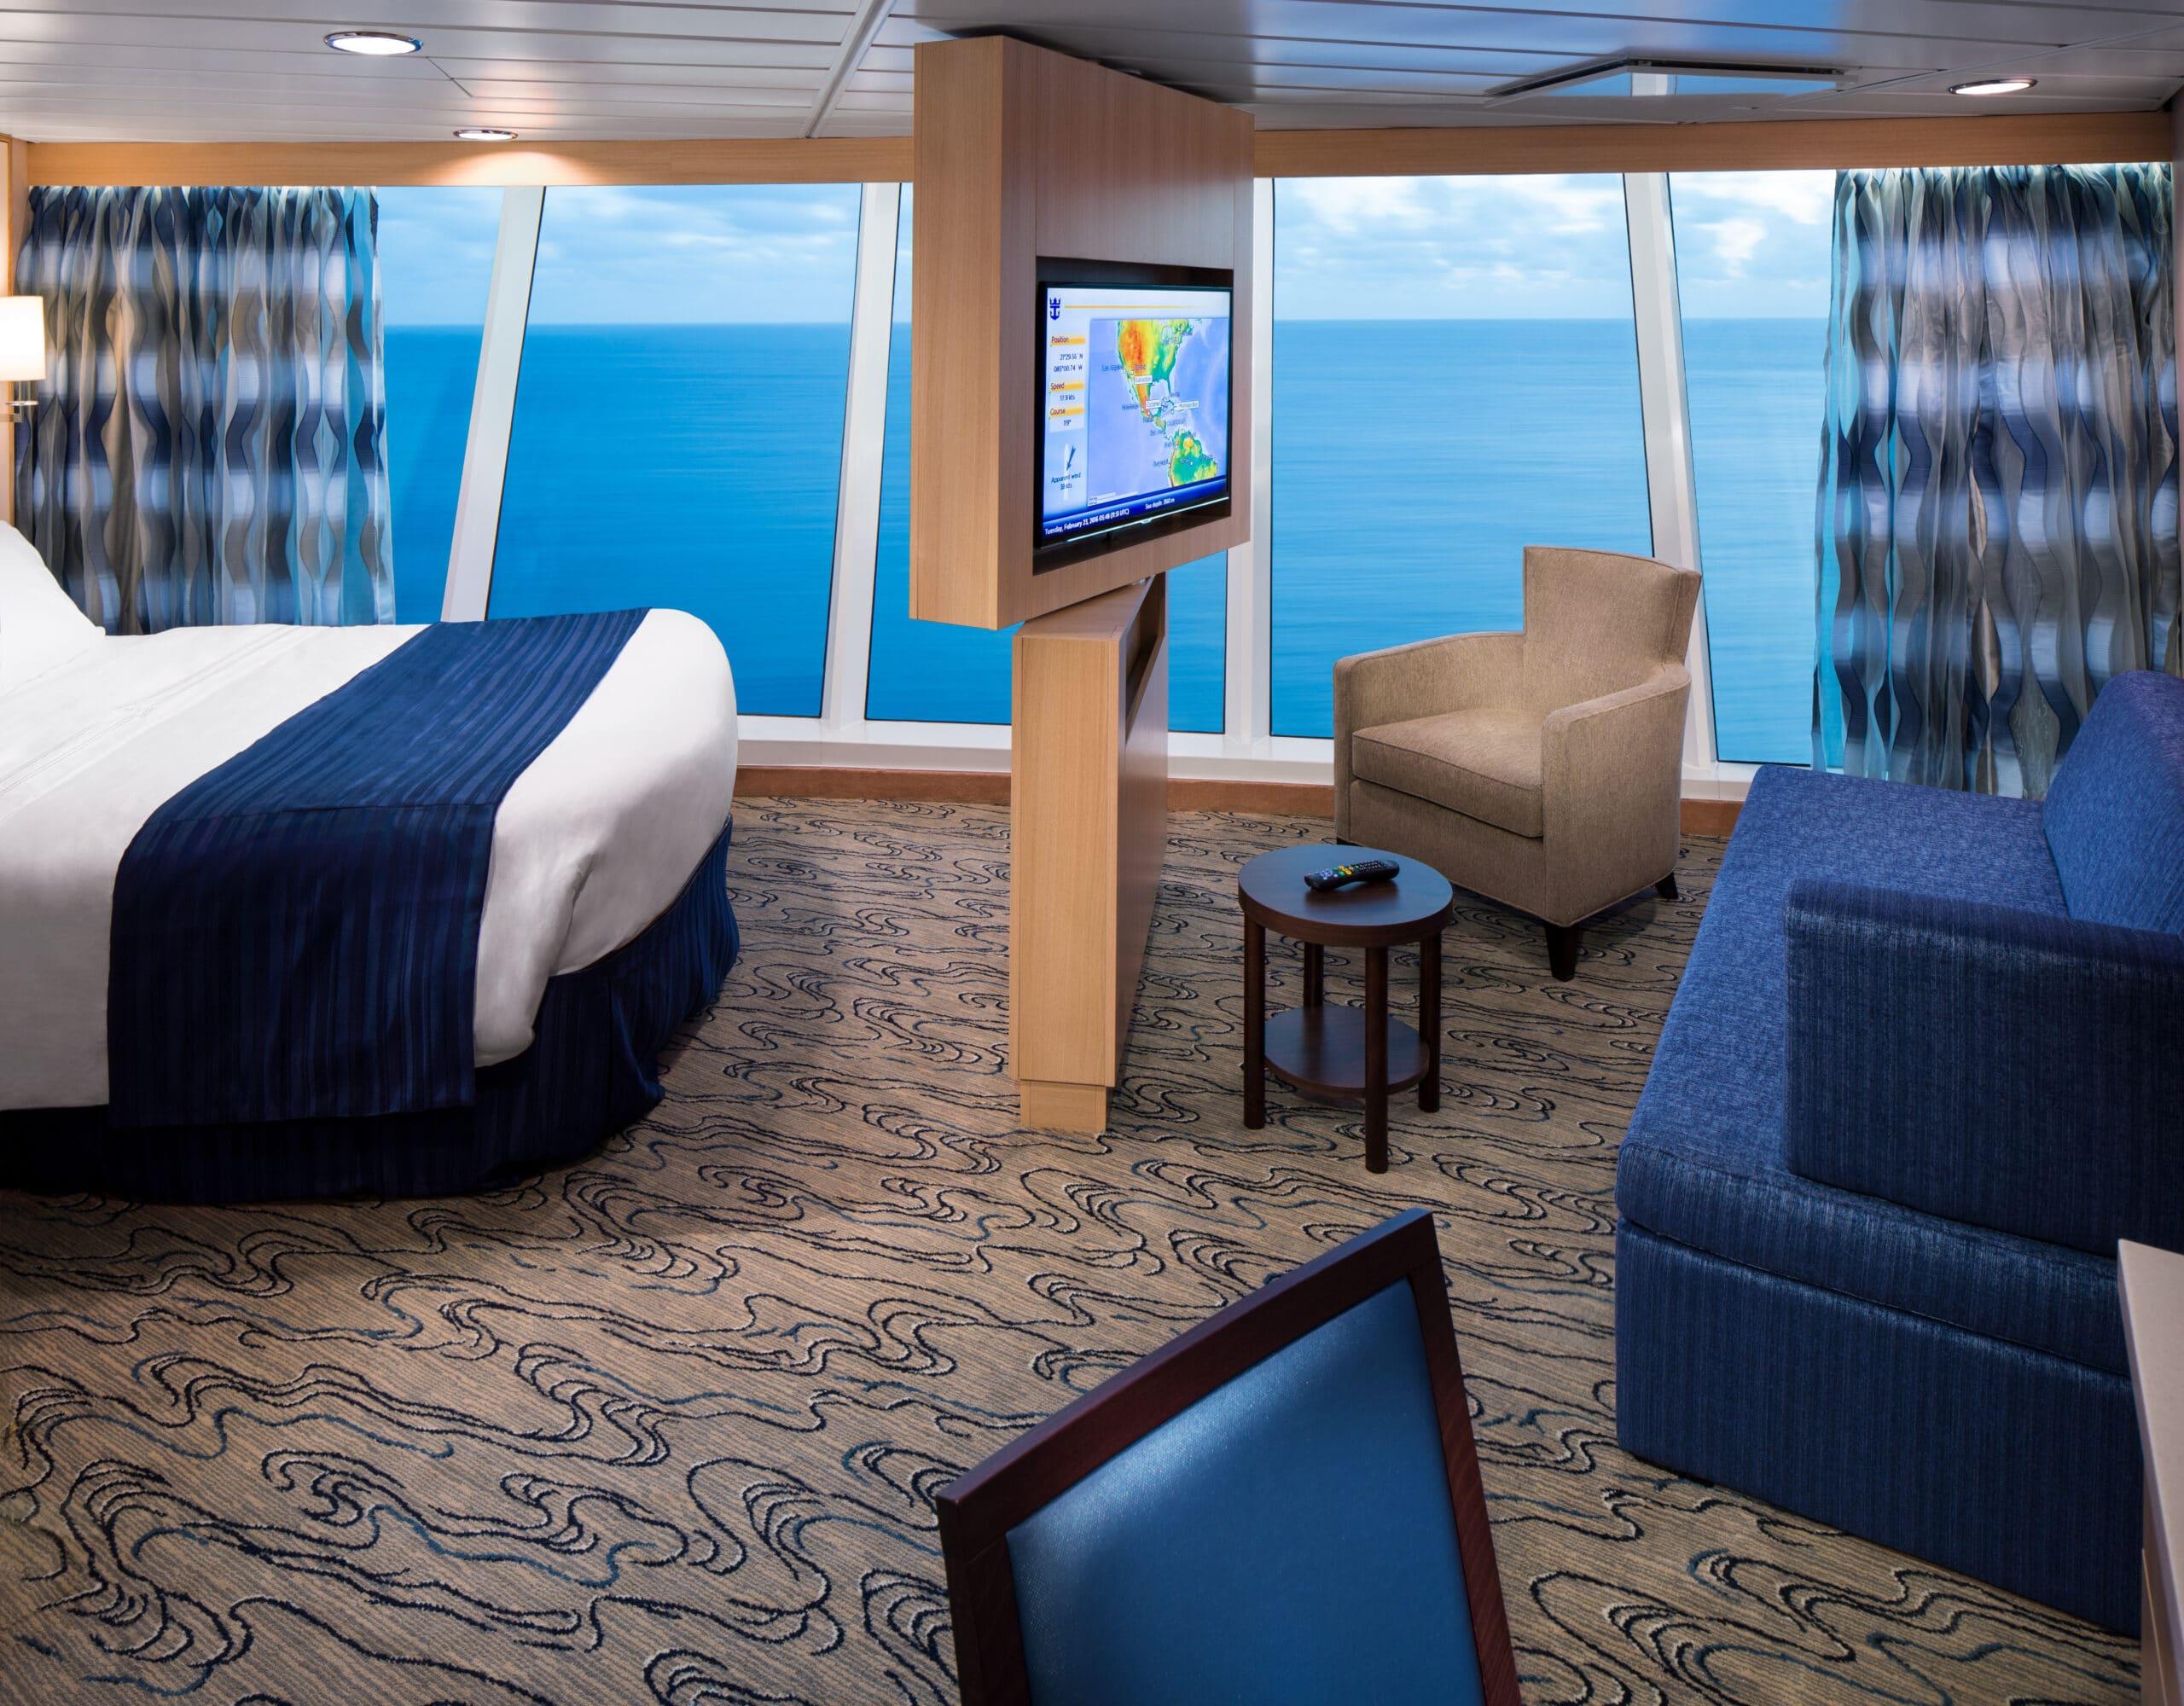 Royal-Caribbean-International-Freedom-of-the-Seas-Liberty-of-the Seas-Independence-of-the-seas-schip-cruiseschip-categorie VP-Panorama Suite